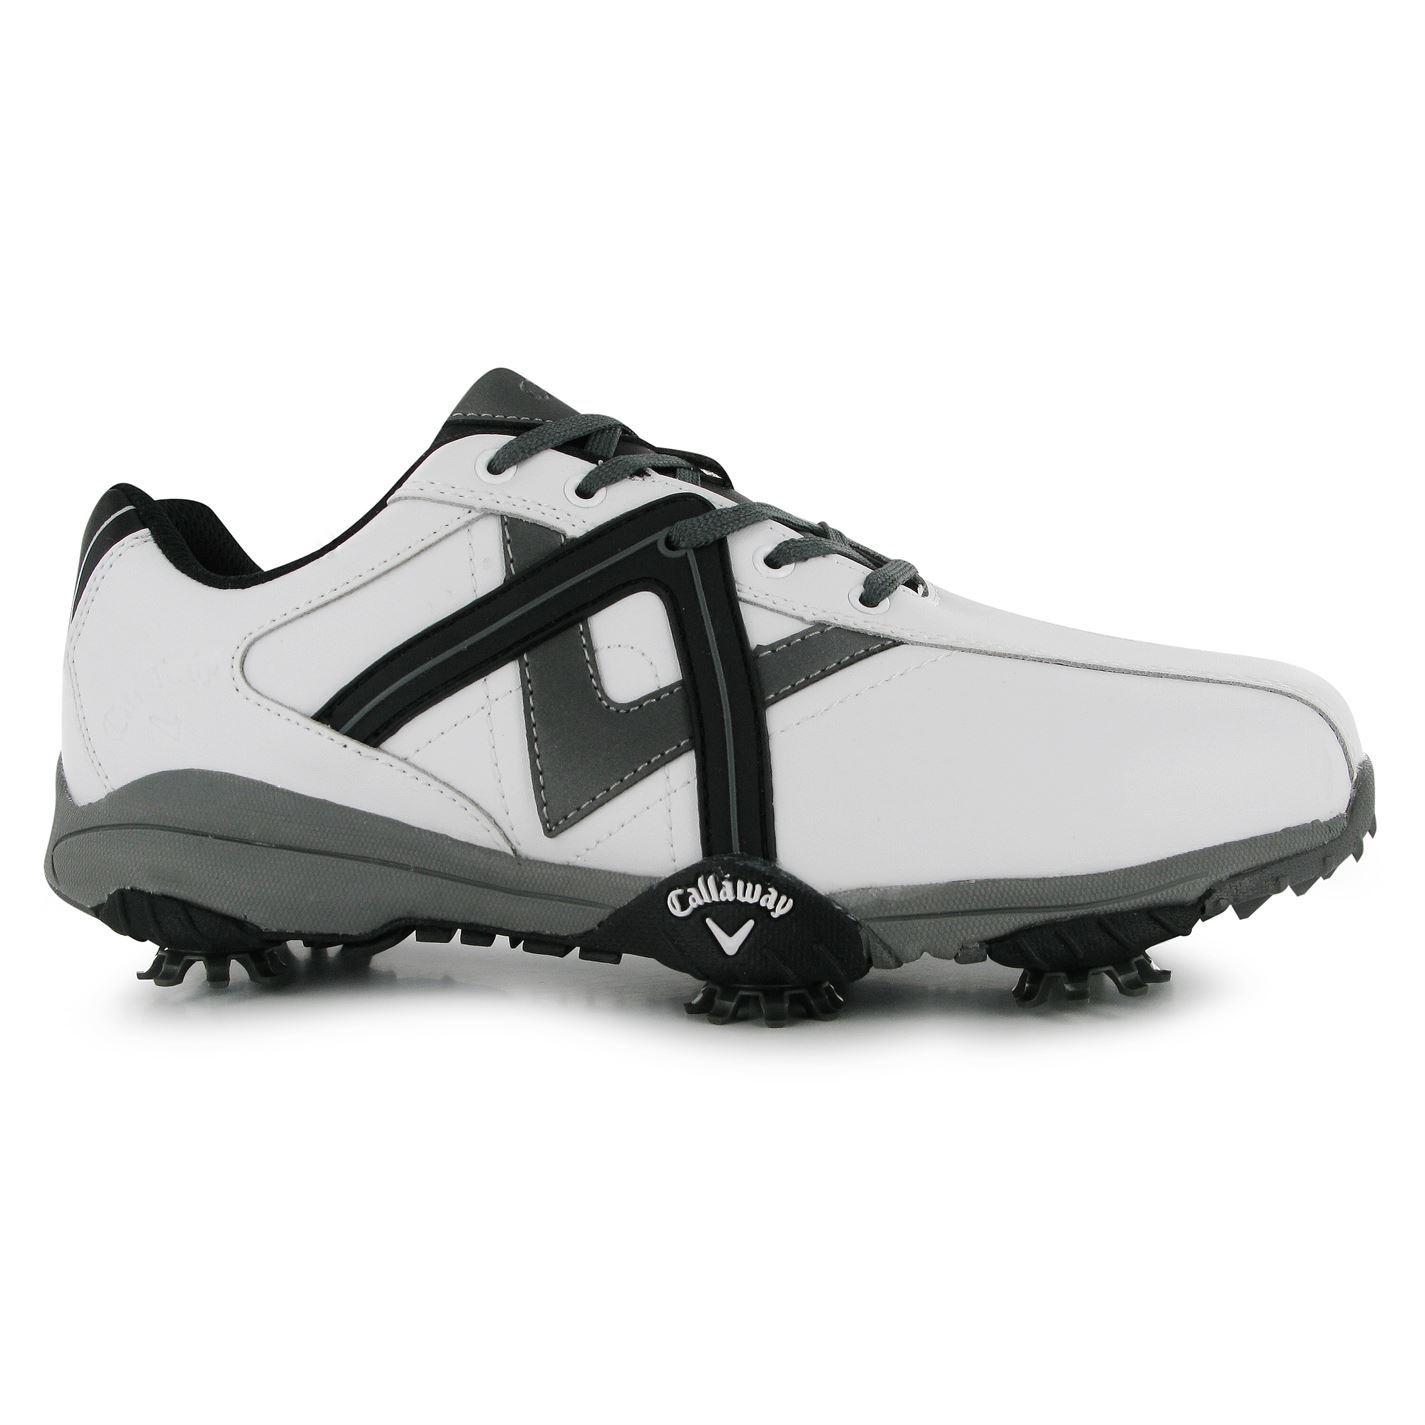 Callaway-Cheviot-ll-Golf-Shoes-Mens-Spikes-Footwear thumbnail 17